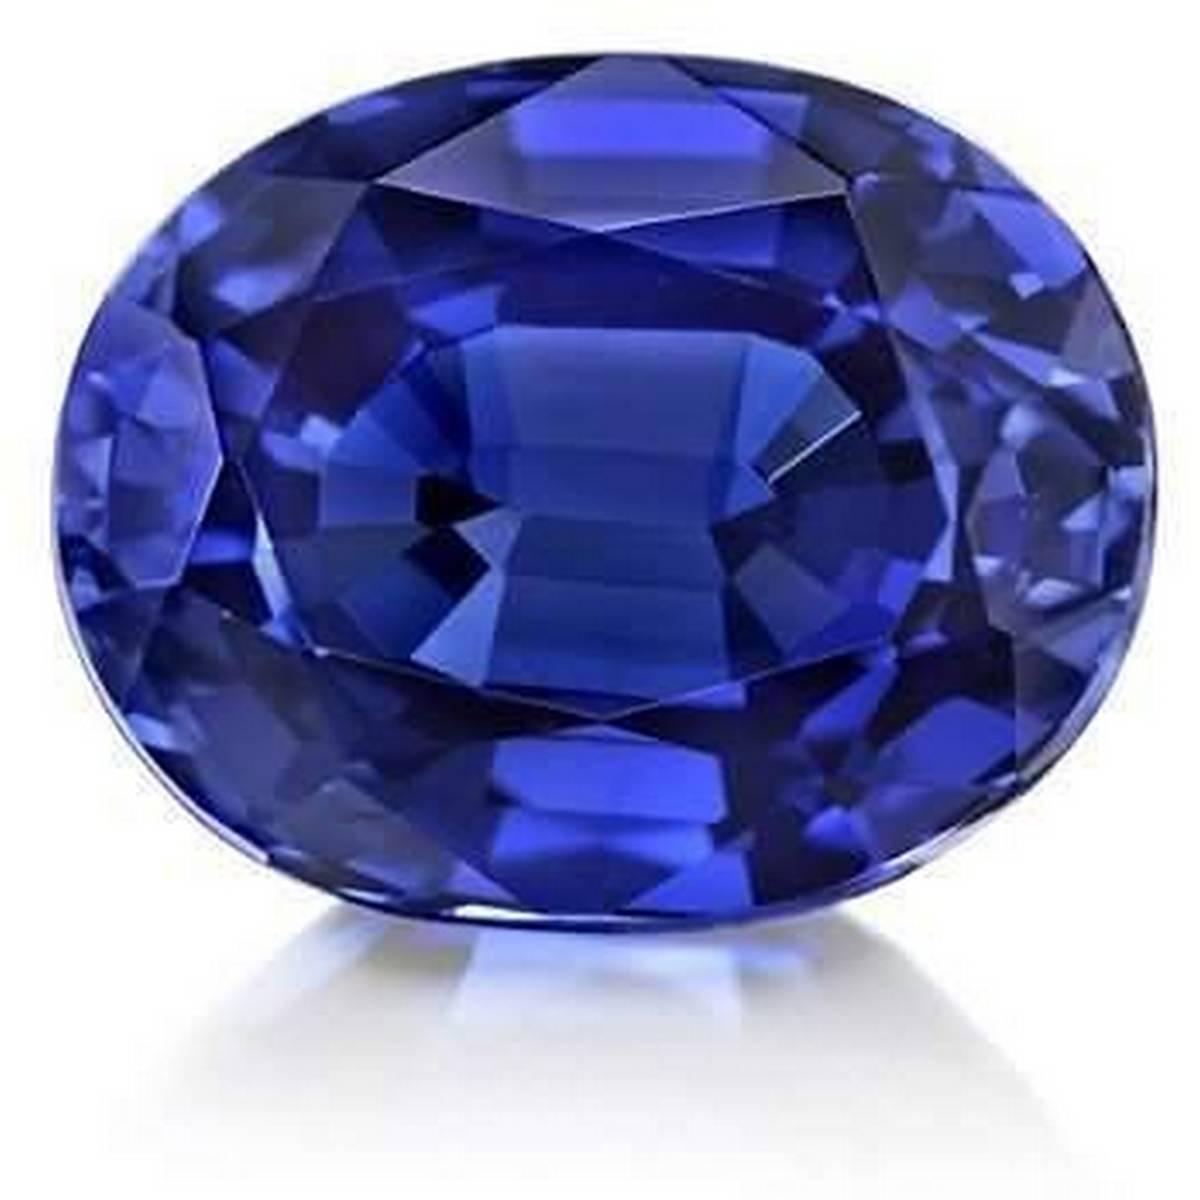 Zamurd Ovel Shape Gemstone Blue Color 4.5 grams (Original)